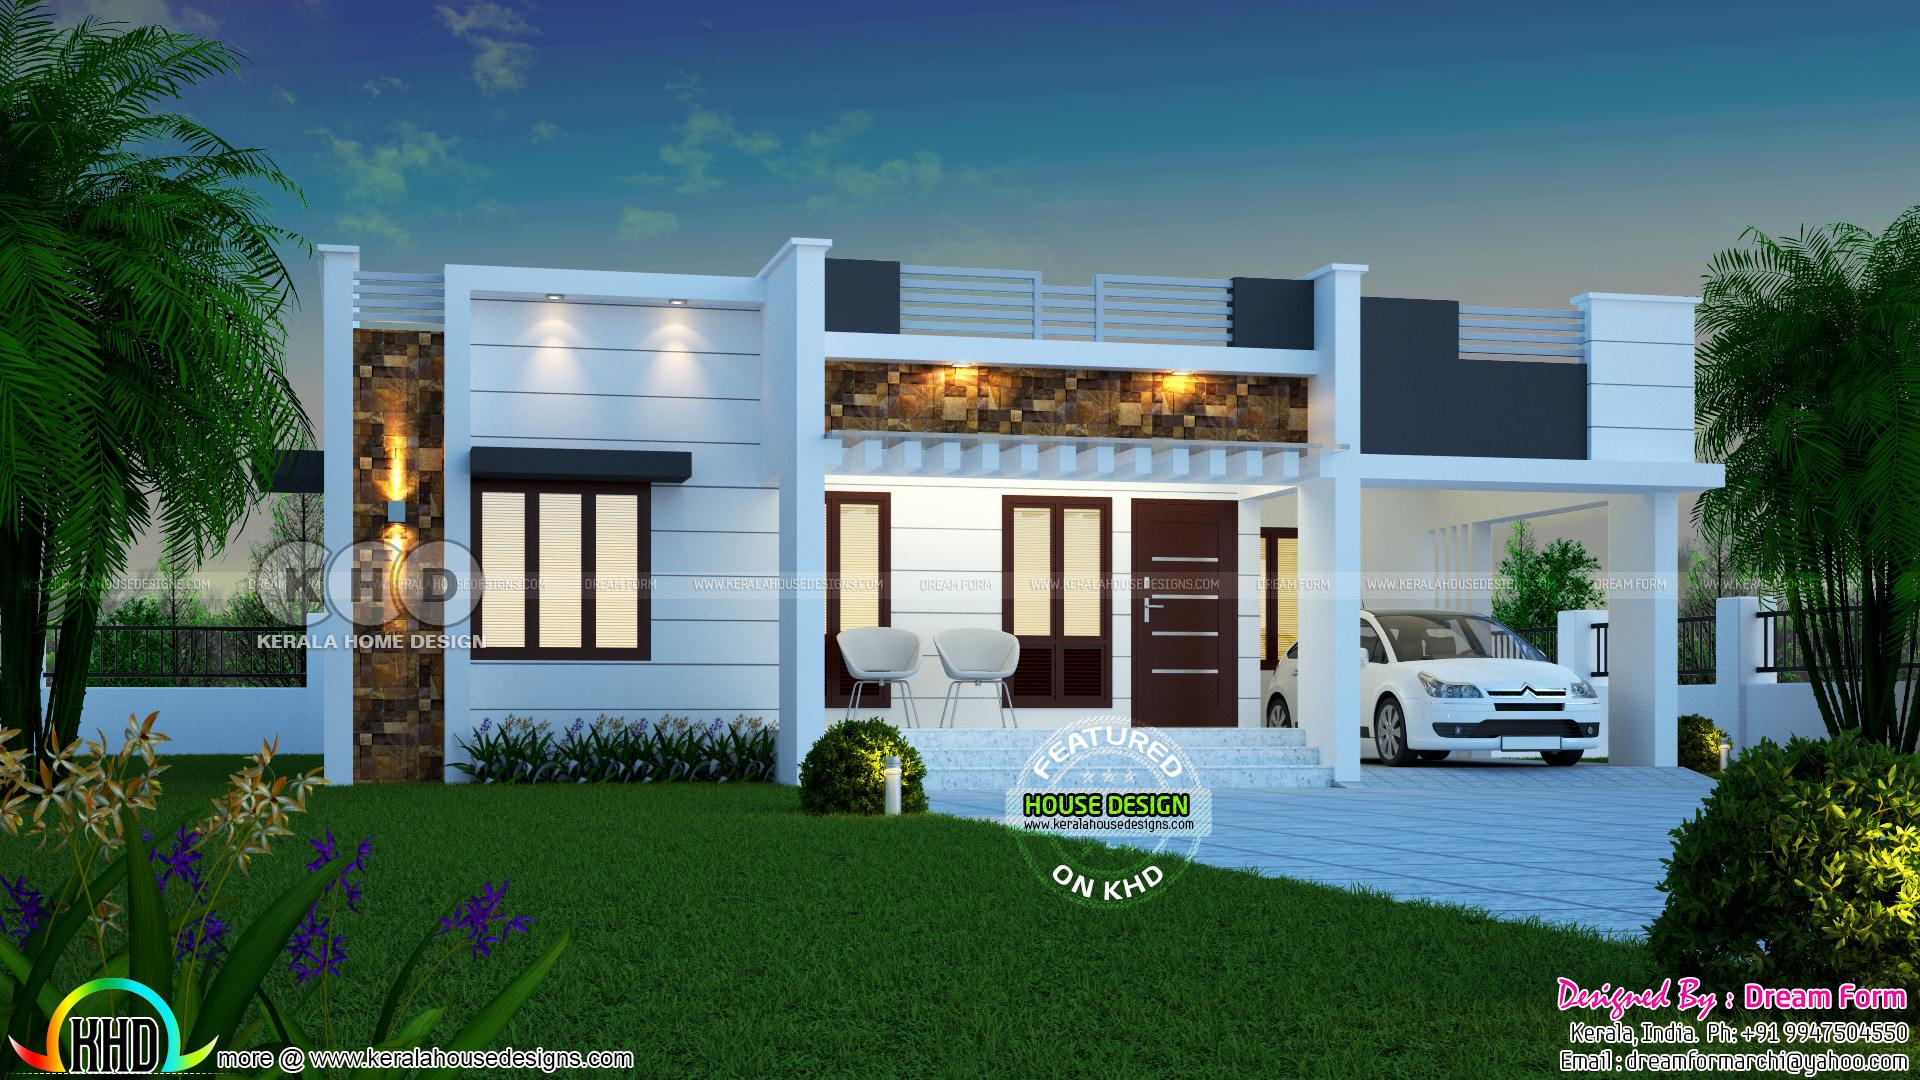 1450 Square Feet 3 Bedroom One Floor Kerala Home